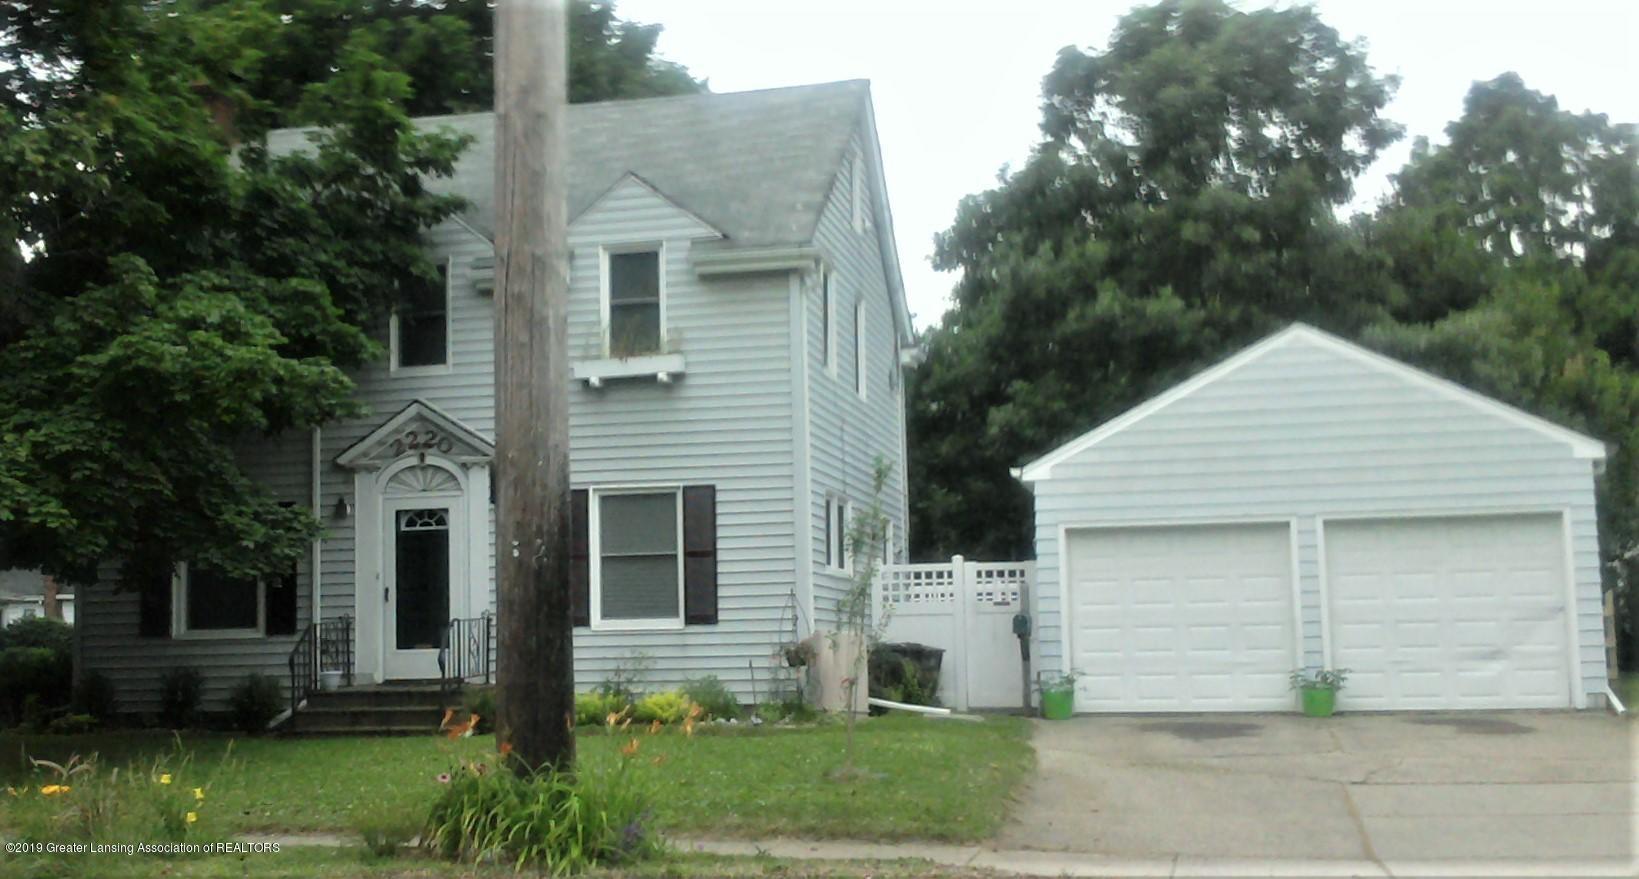 2220 S Pennsylvania Ave - 2010-06-26 07.41.06 (3) - 25